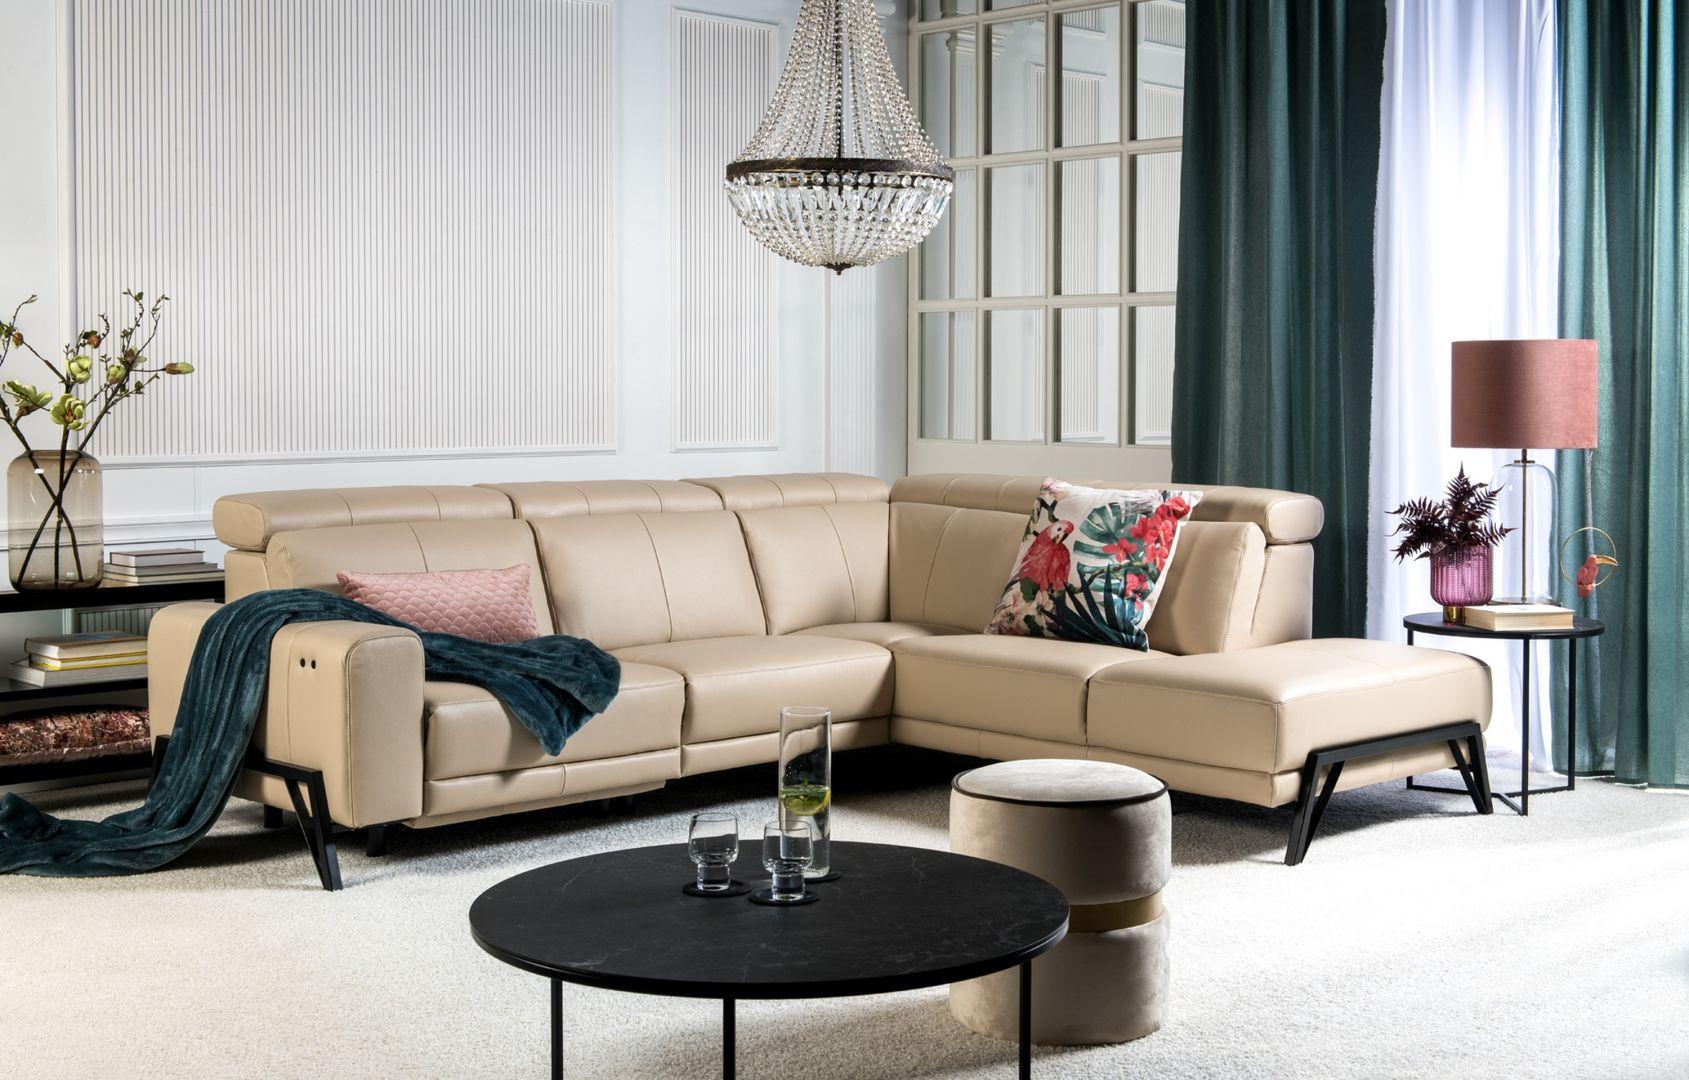 Sofa Tastiera marki Kler